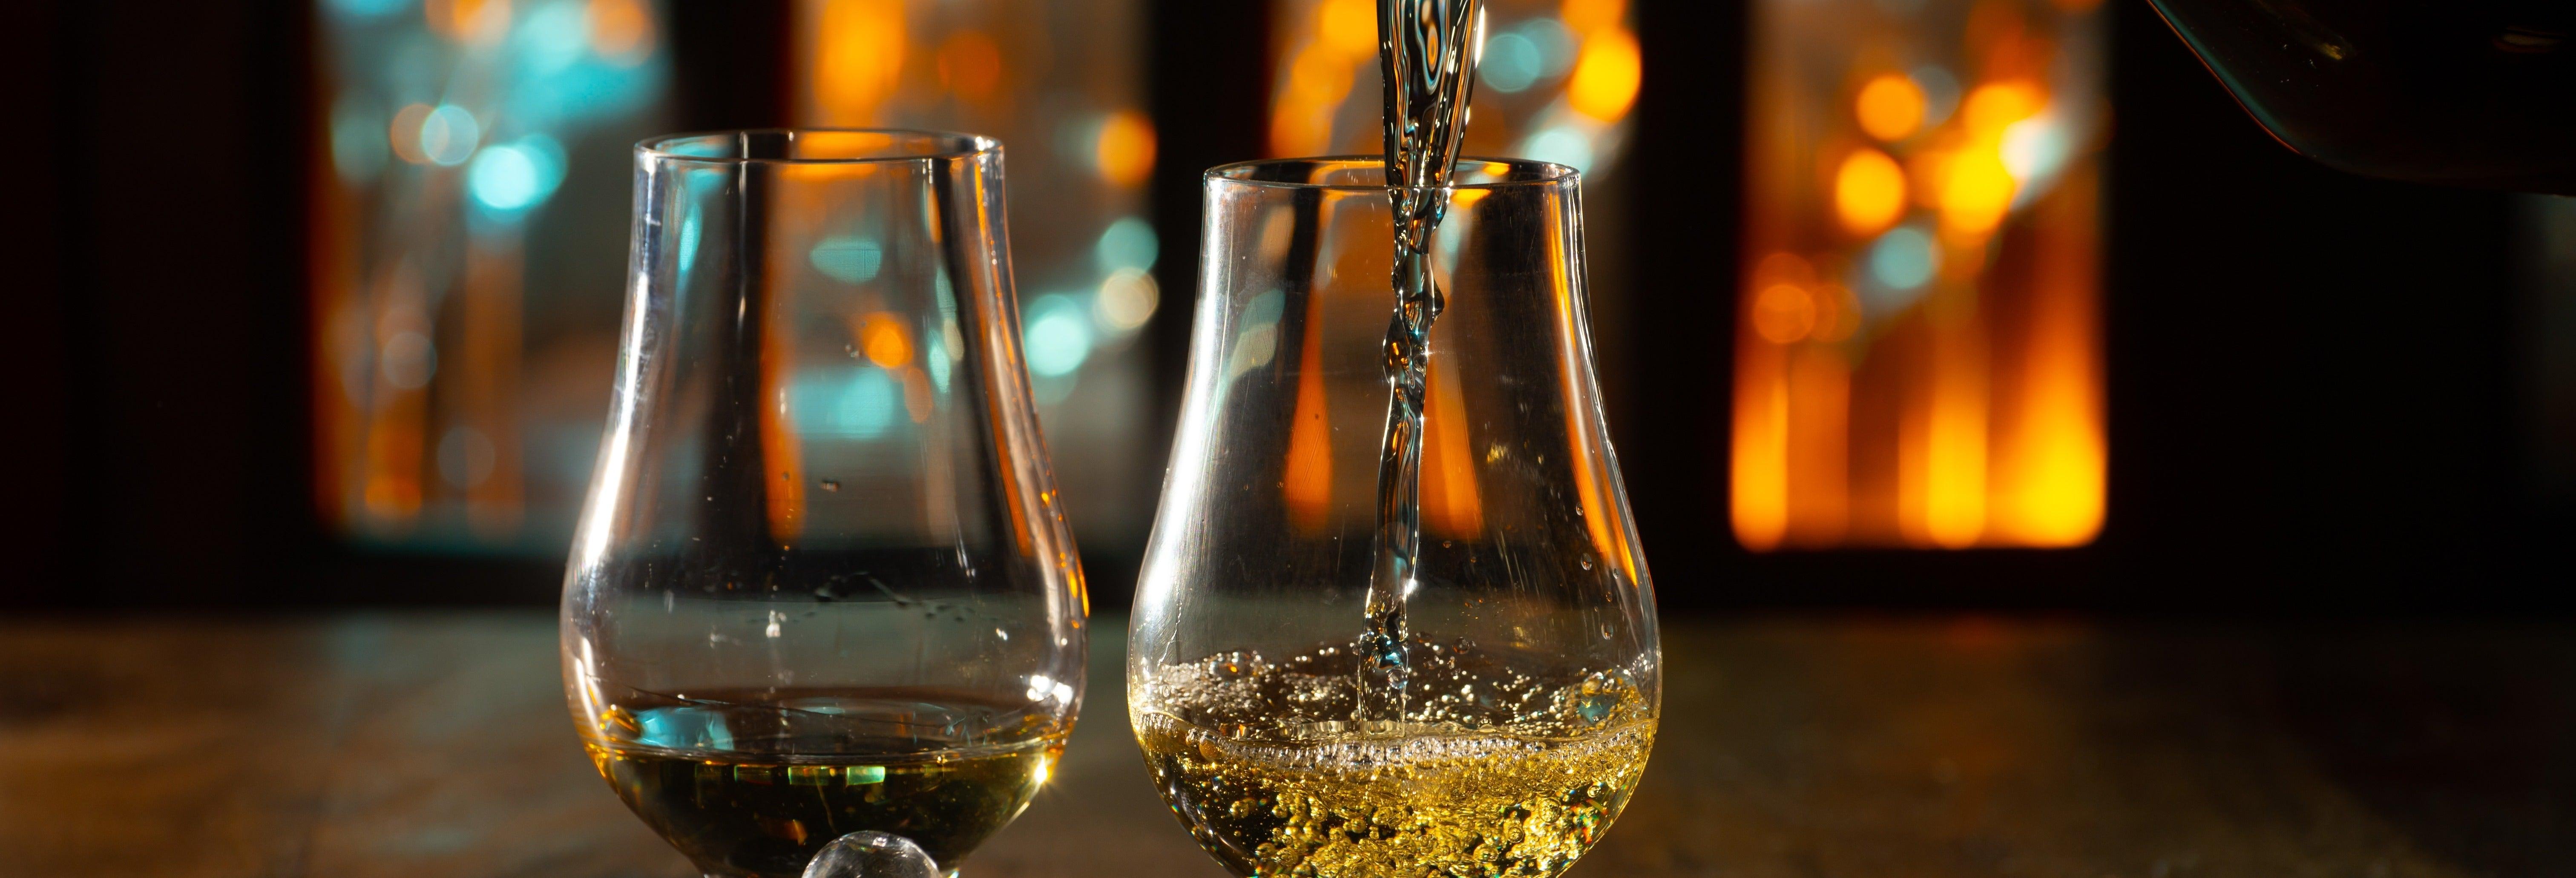 Tour do whisky por Edimburgo